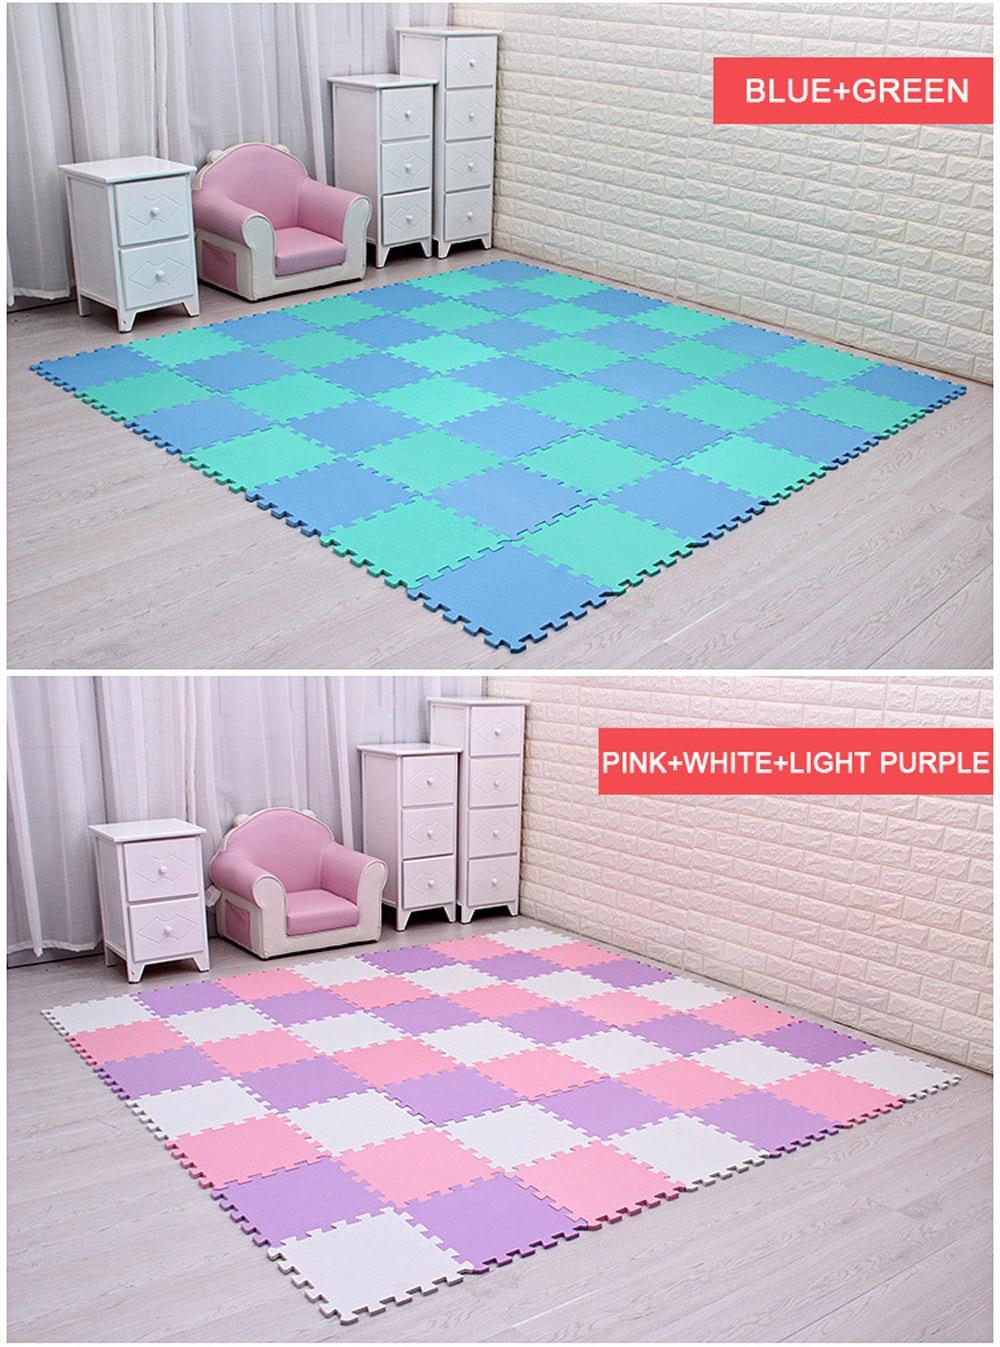 Newest 9/18pcs/set EVA Children's Foam Carpet Mosaic floor Puzzle Carpet Baby Play Mat Floor Developing Crawling Rugs Puzzle Mat